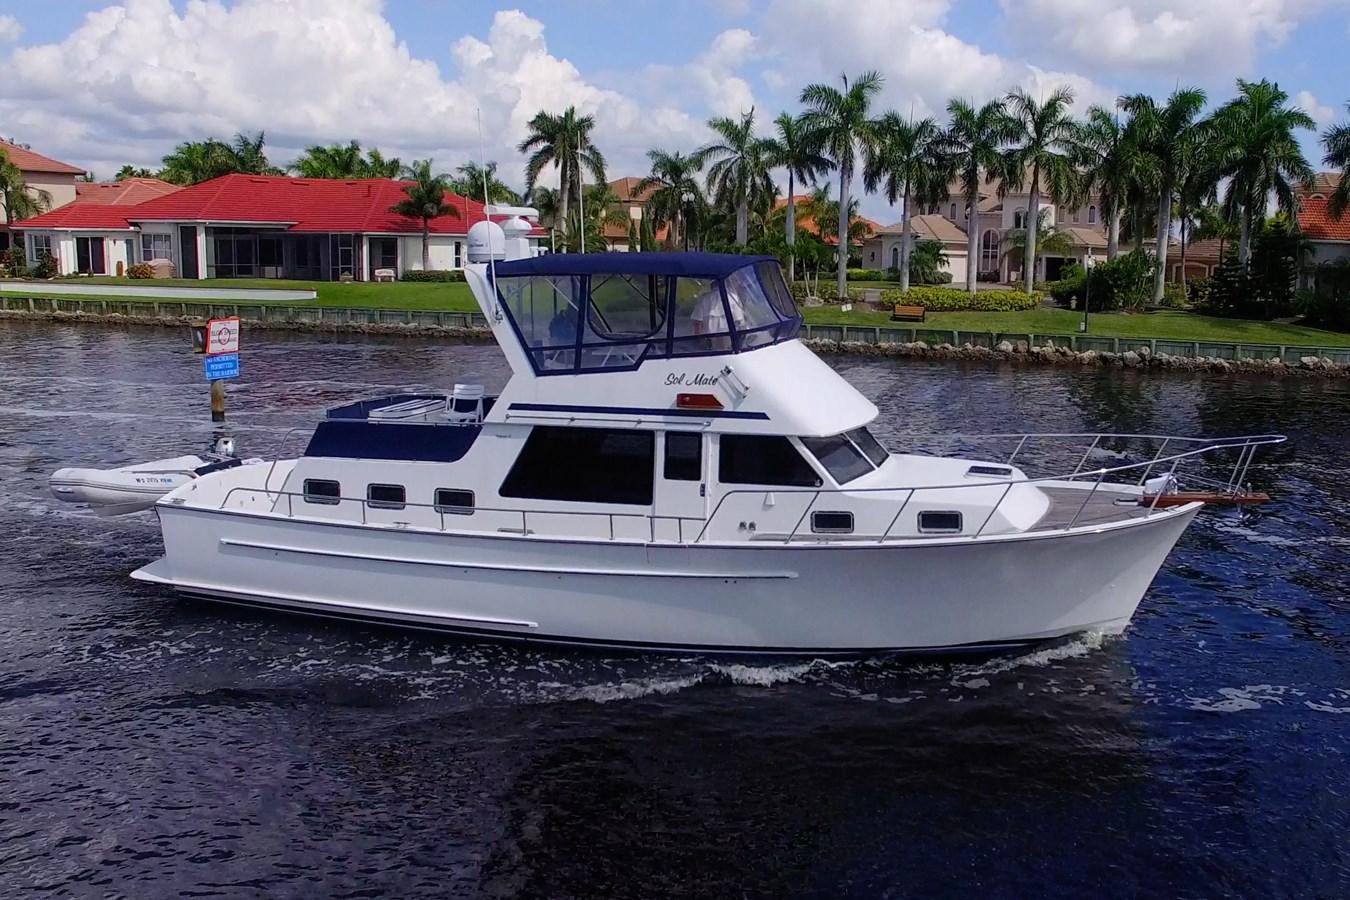 7264623_20191029102307148_1_XLARGE 2004 WESTCOAST 46 Trawler Trawler 2757890